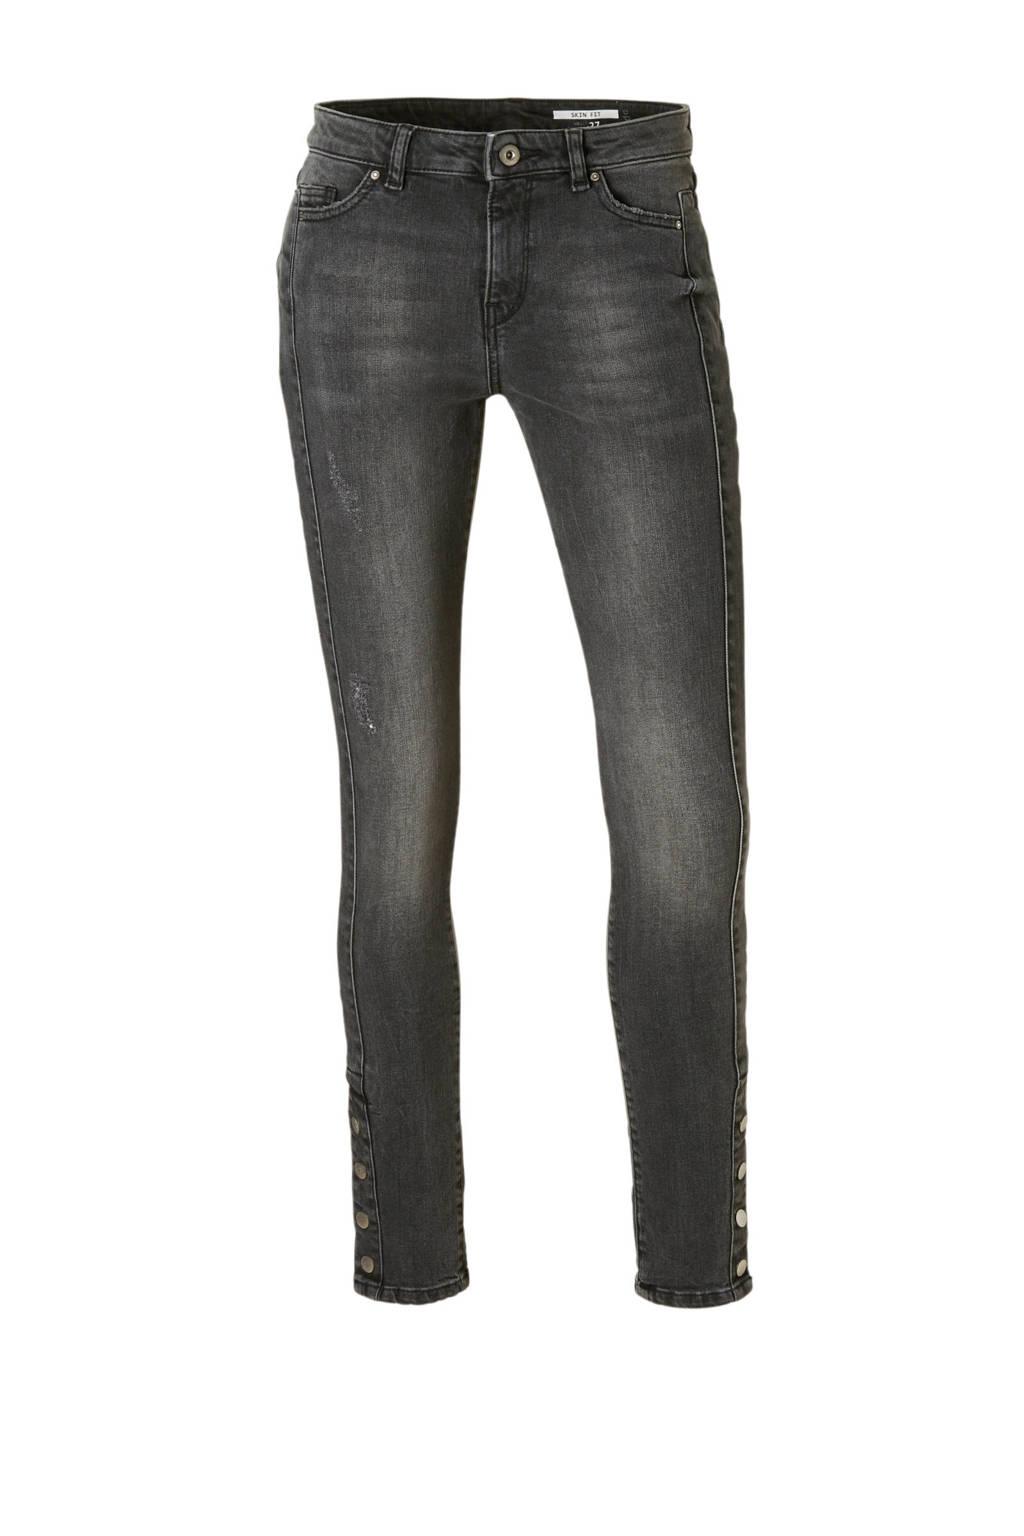 edc Women skinny jeans met knoop details, Grijs